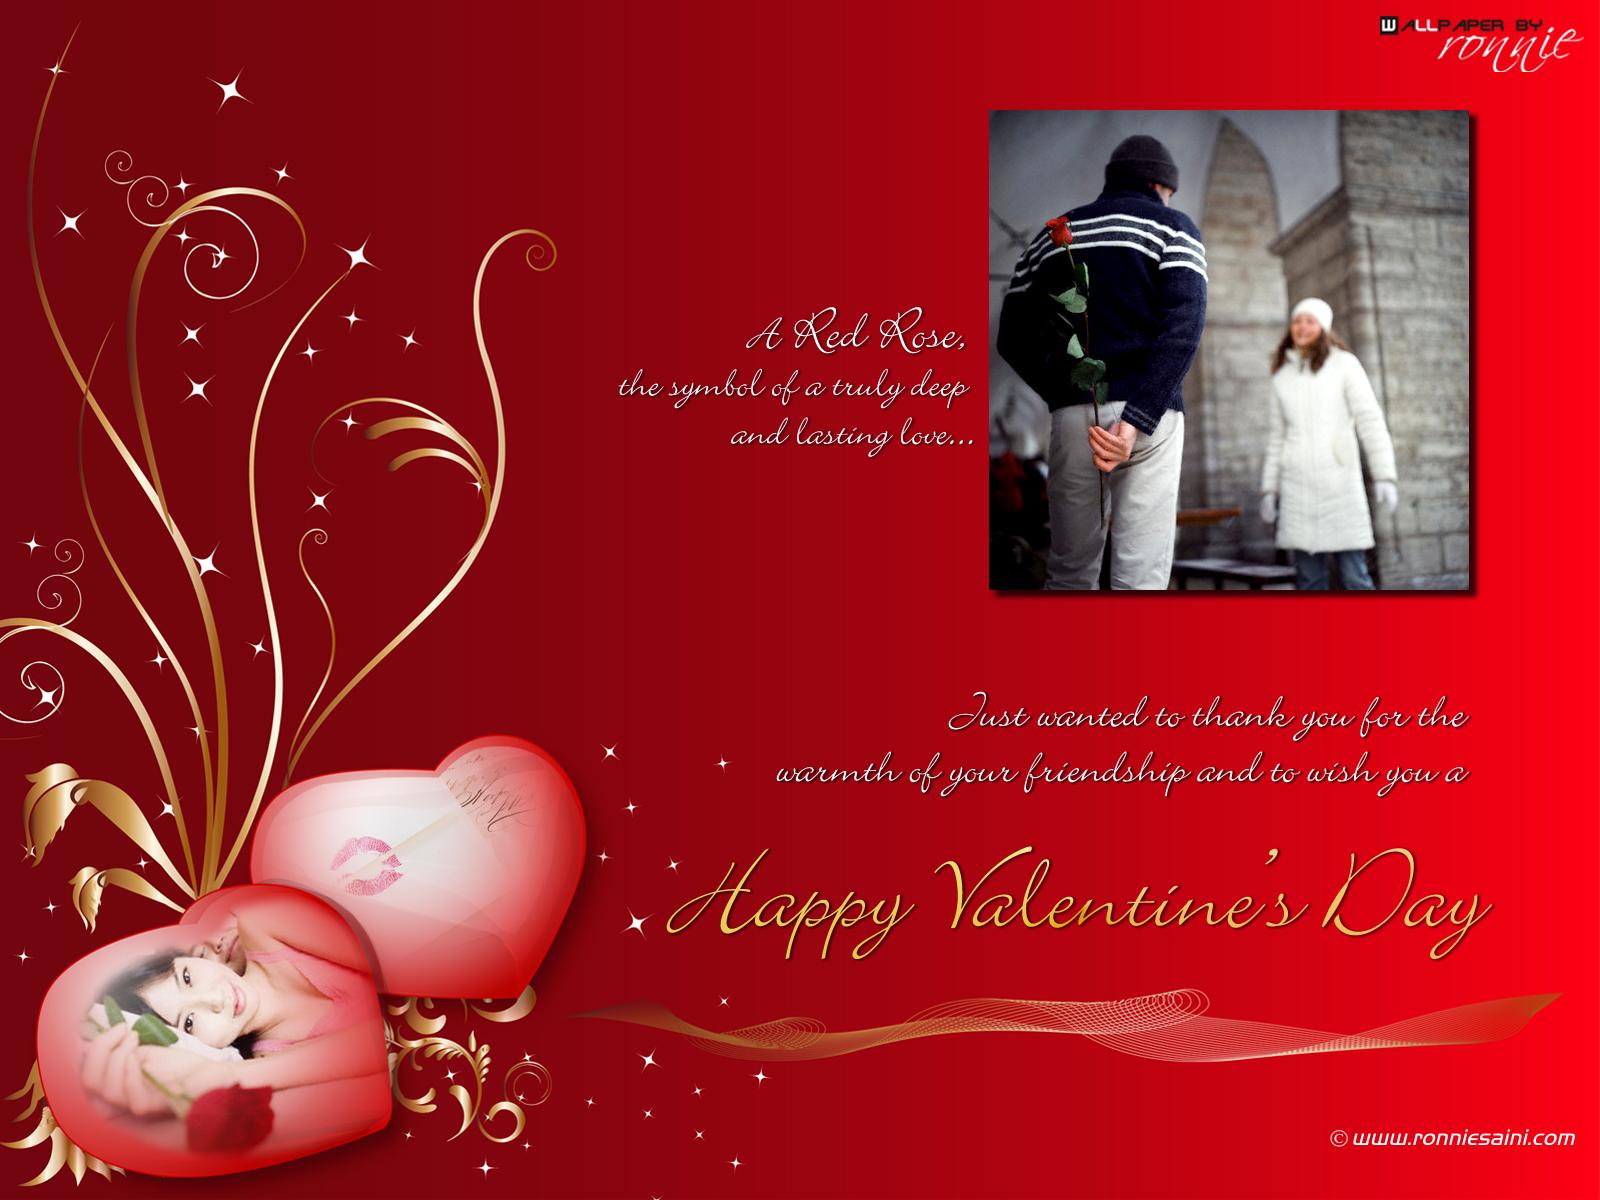 http://2.bp.blogspot.com/-fzeELw4stYg/TscFQJJQIYI/AAAAAAAAAxc/SQLyND0BJIA/s1600/valentines-day-wallpaper-hd-5-756324.jpg